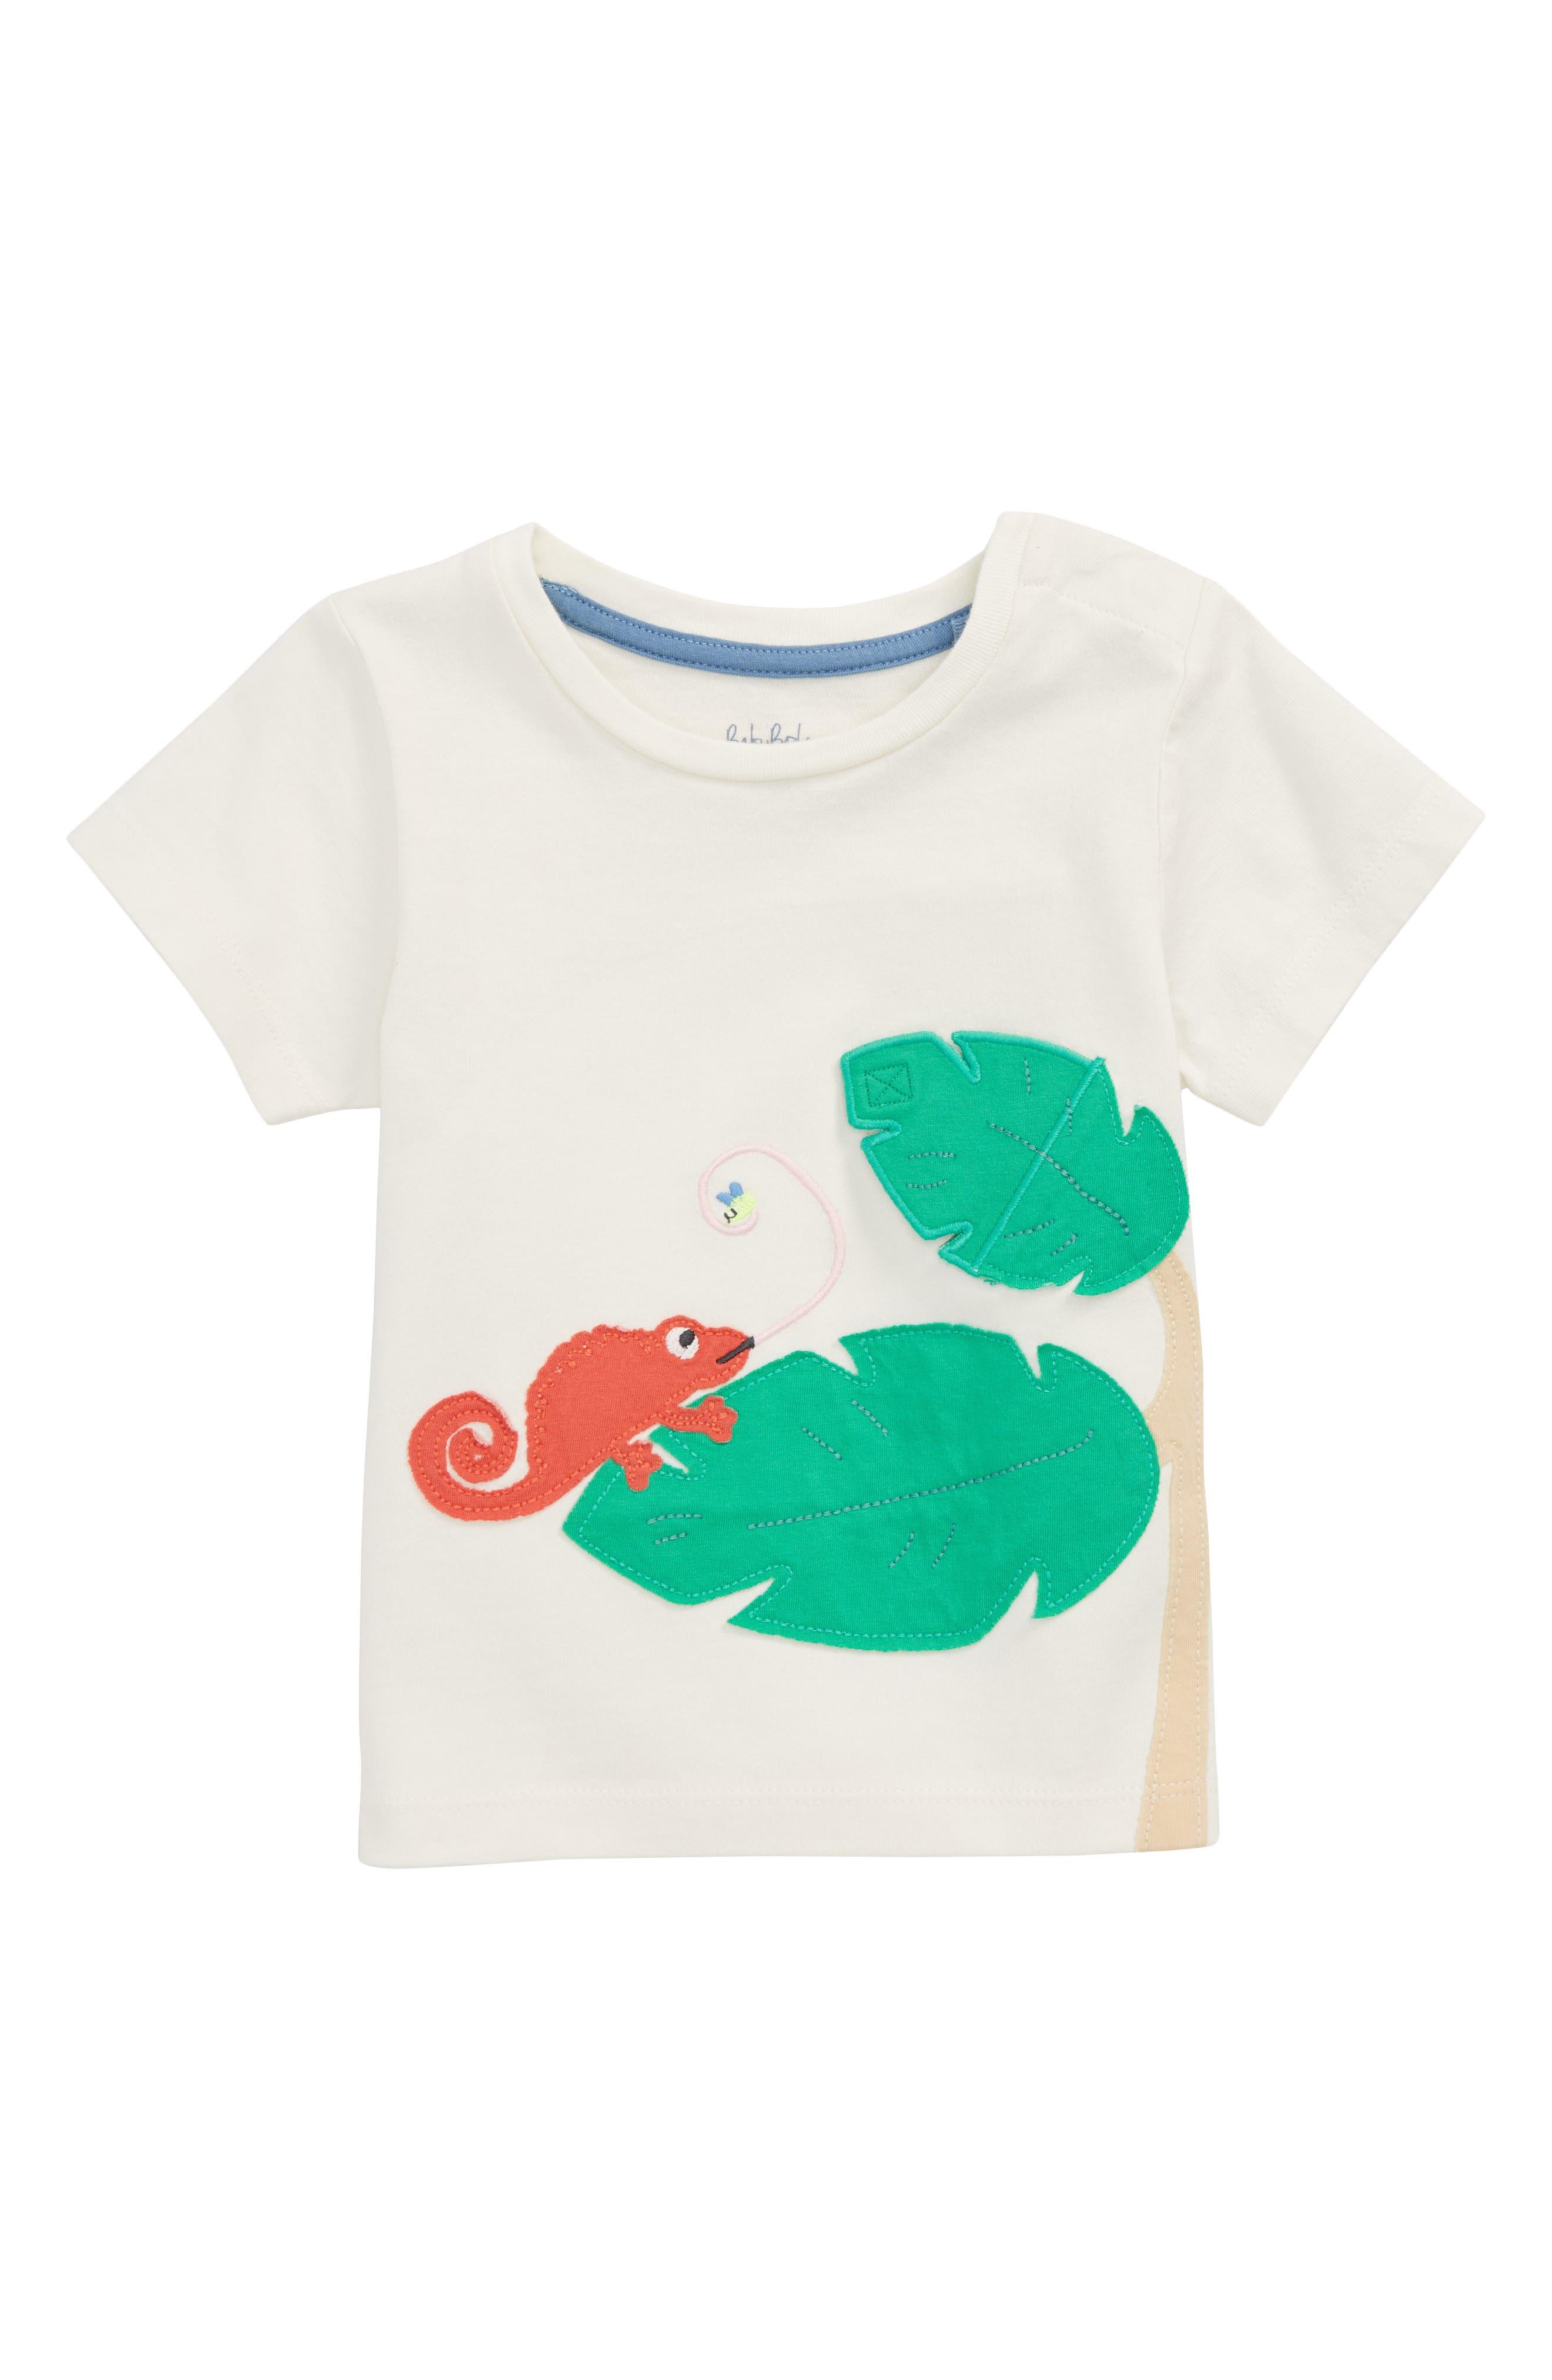 Peekaboo T-Shirt,                             Main thumbnail 1, color,